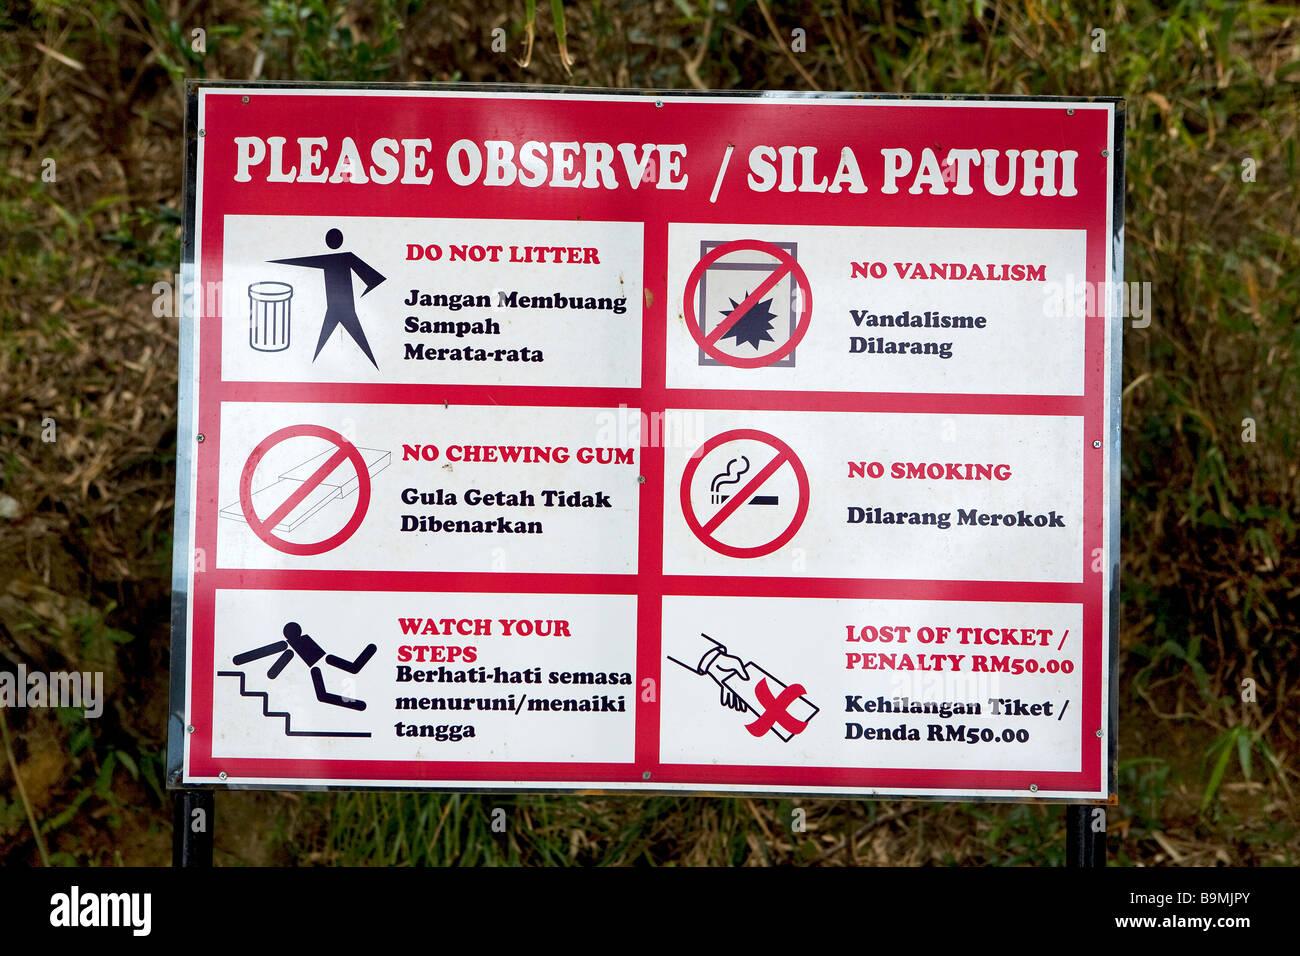 Malaysia Kedah State Langkawi Island A Forbidding Sign Stock Photo Alamy